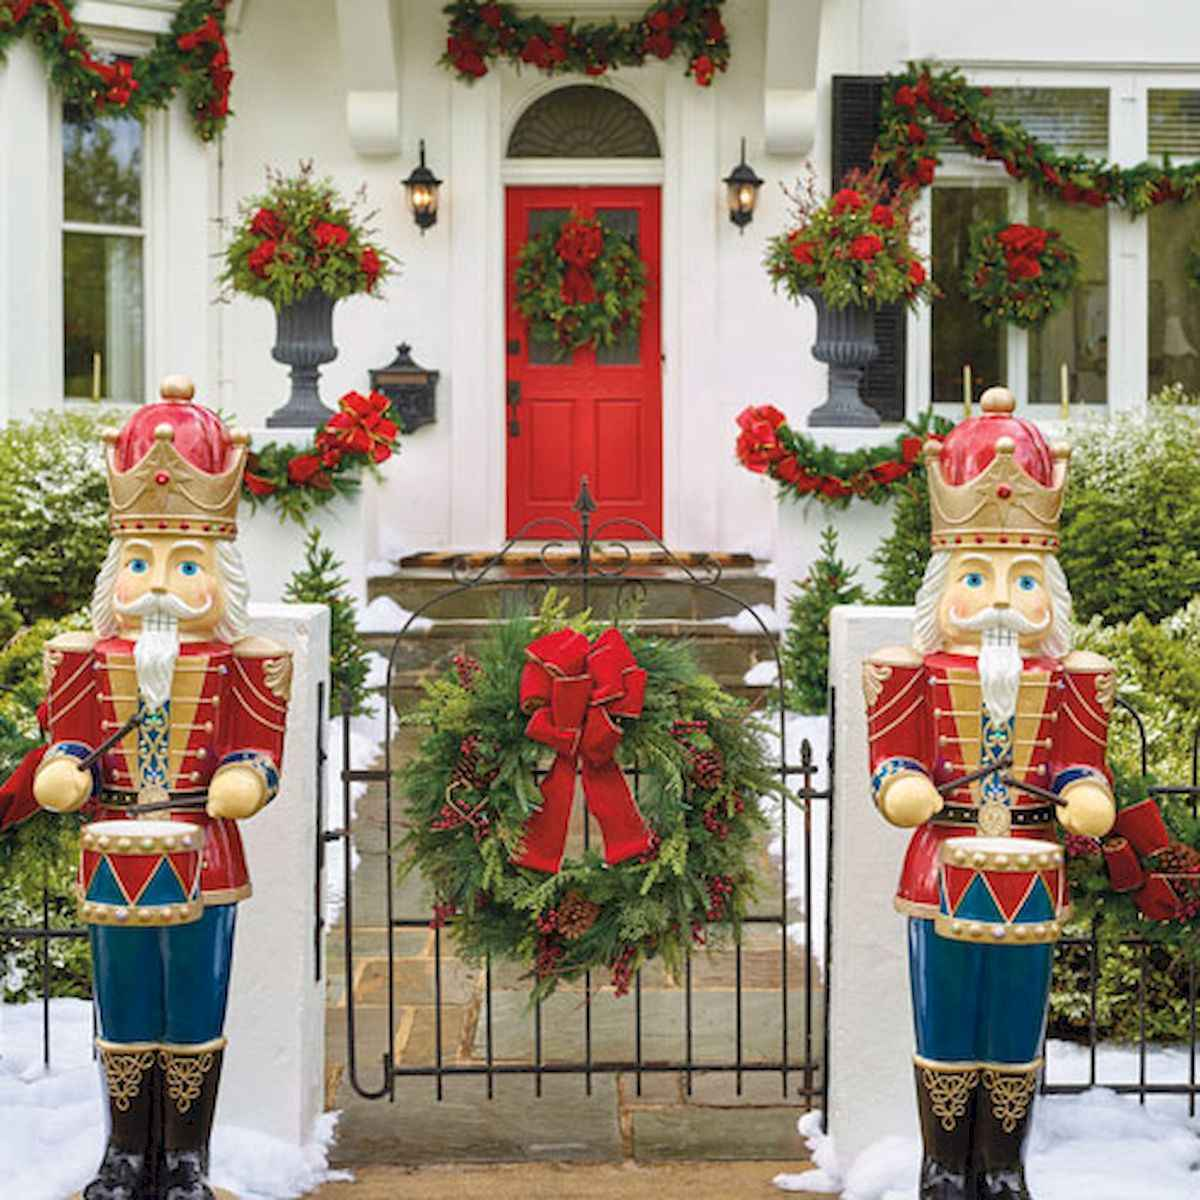 40 amazing outdoor christmas decorations ideas (32)